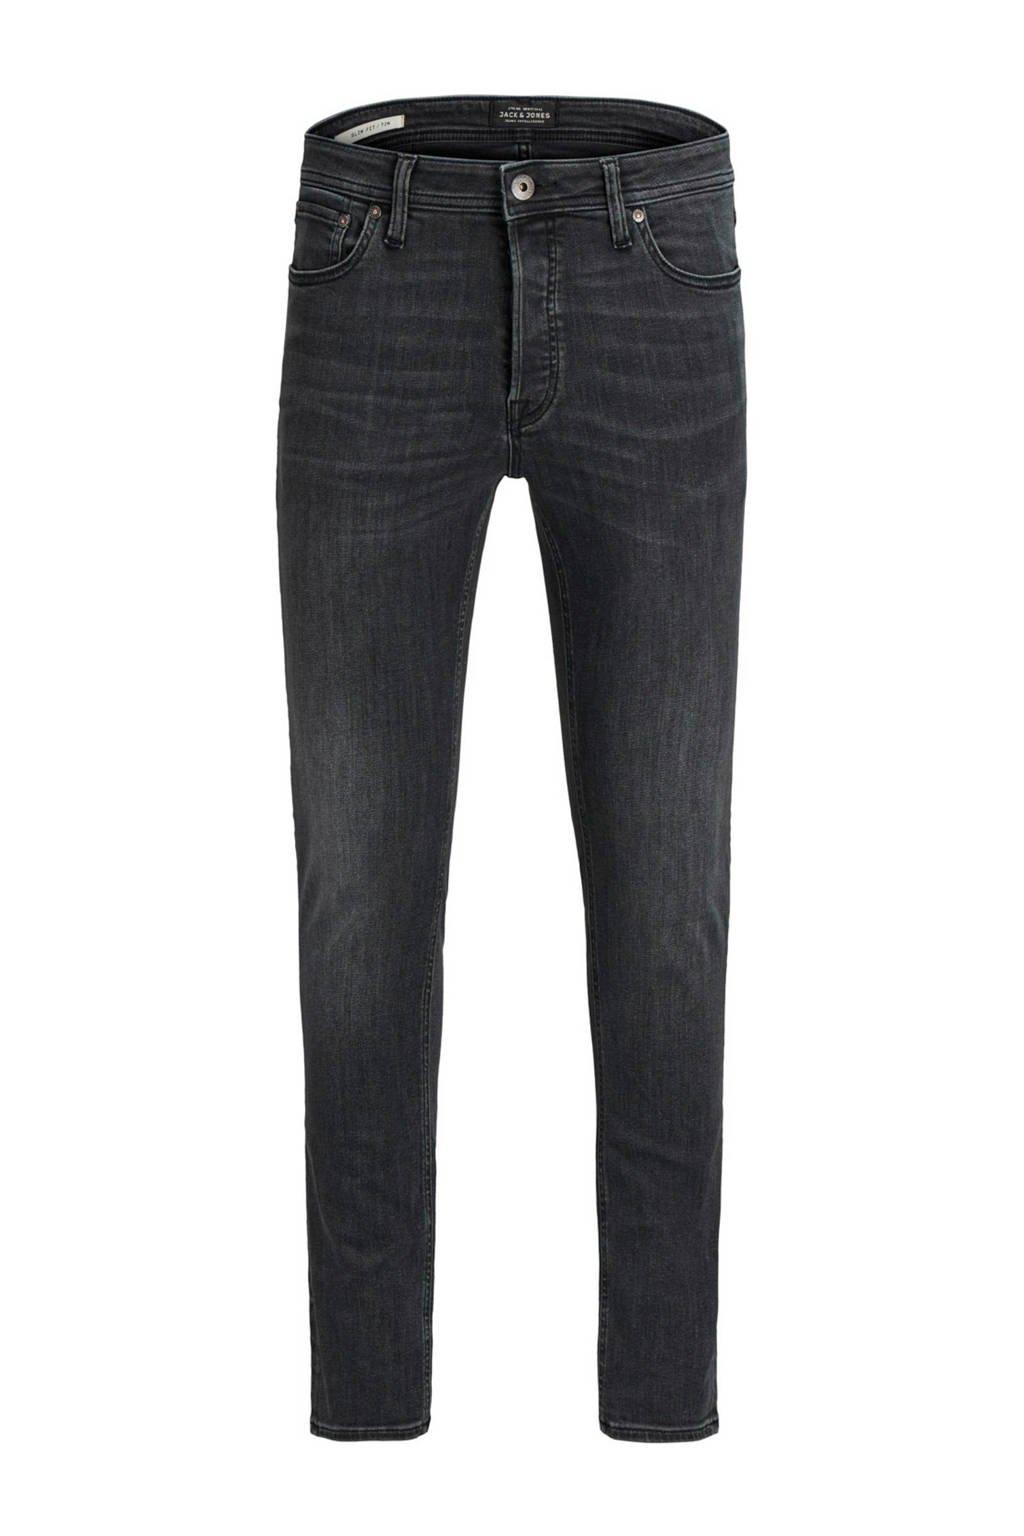 Jack & Jones Jeans Intelligence slim fit jeans Tim, Black denim